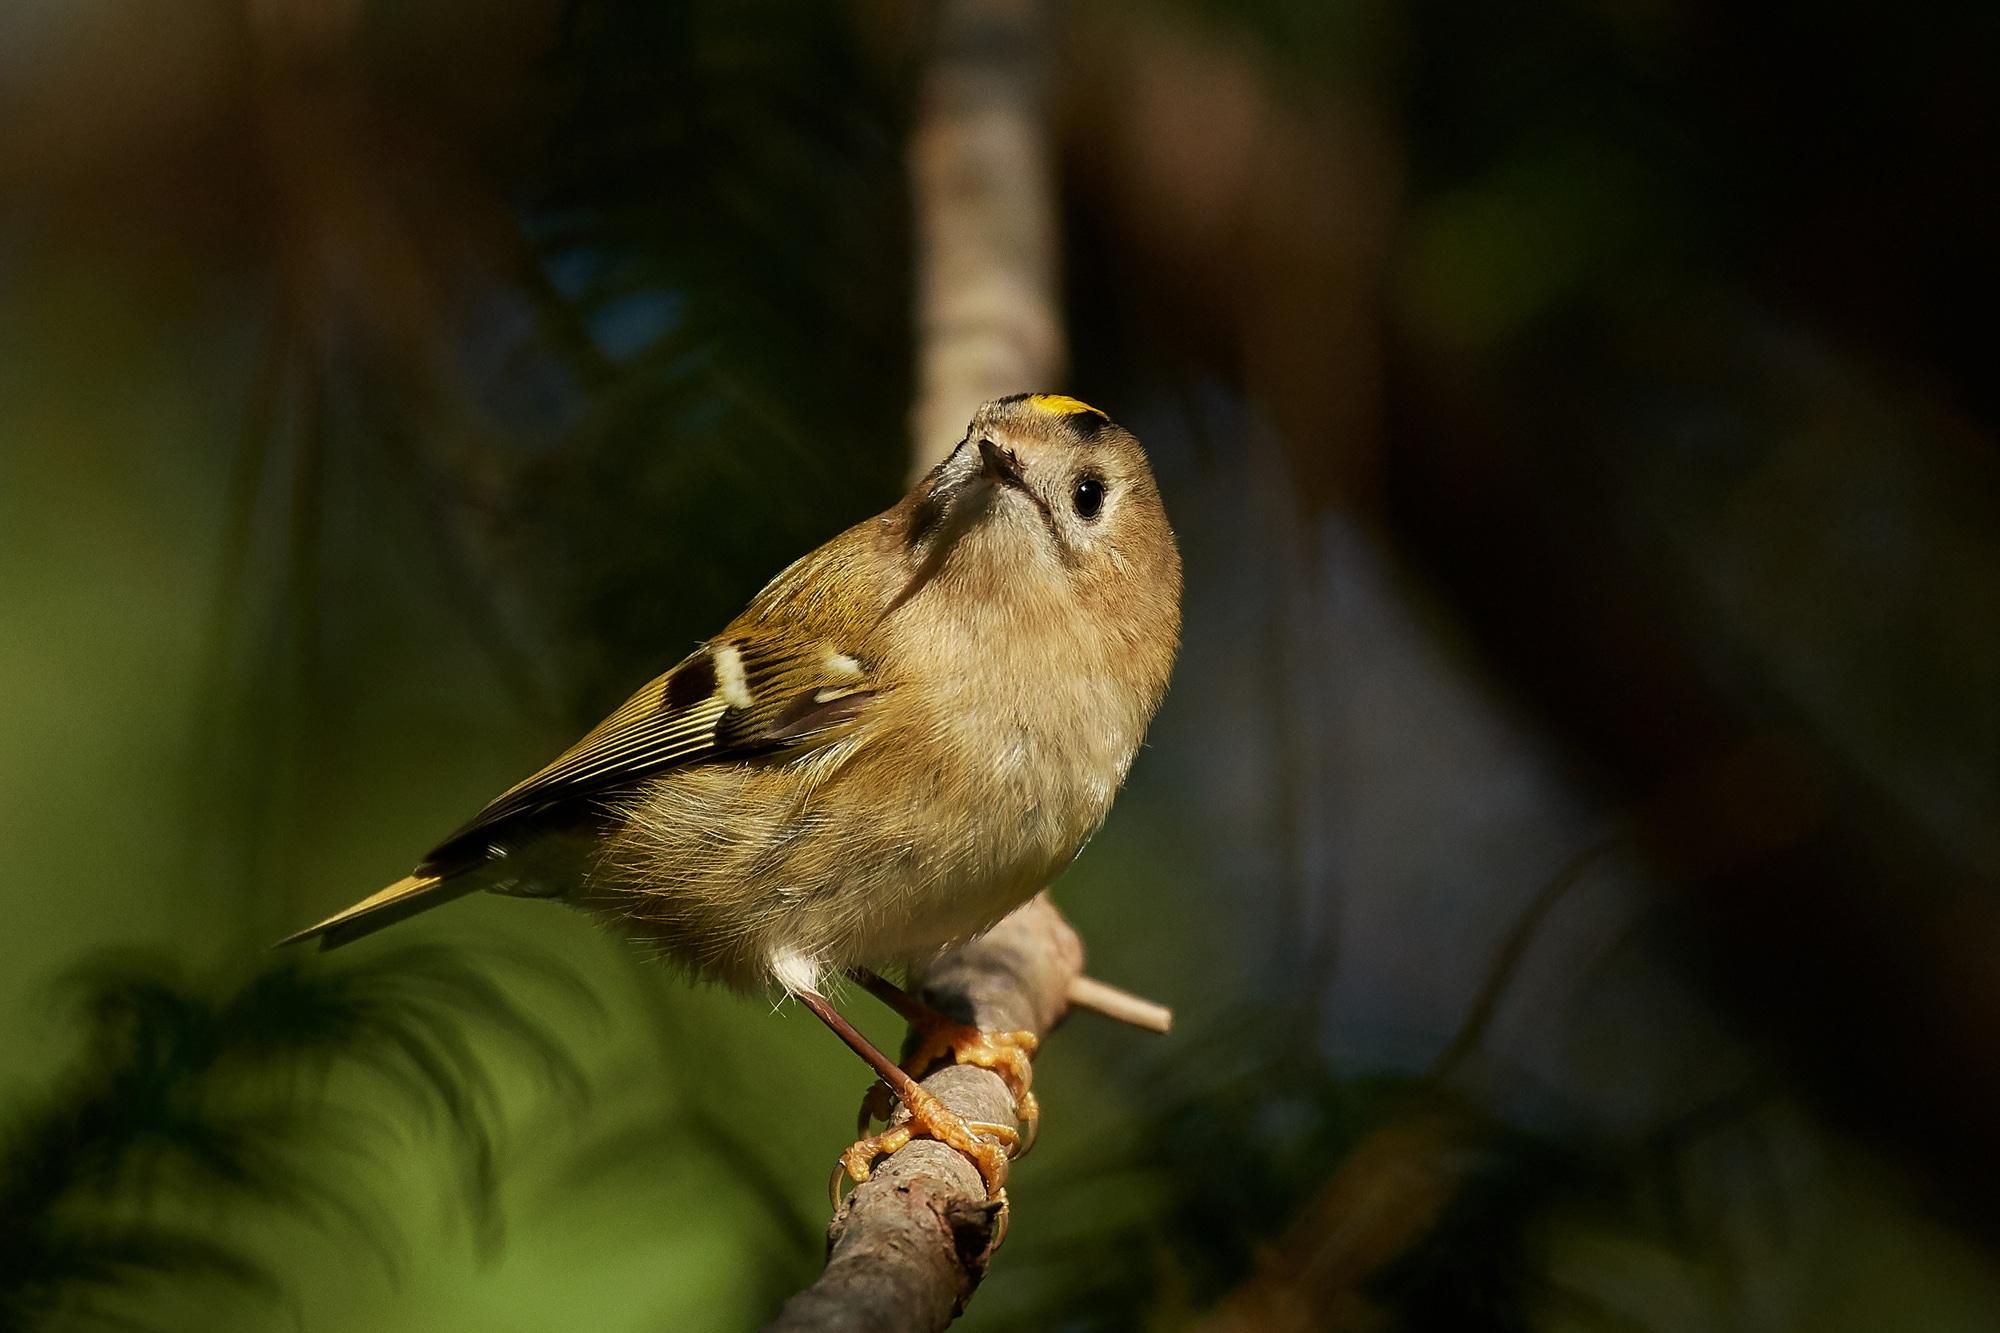 A goldcrest in its UK habitat